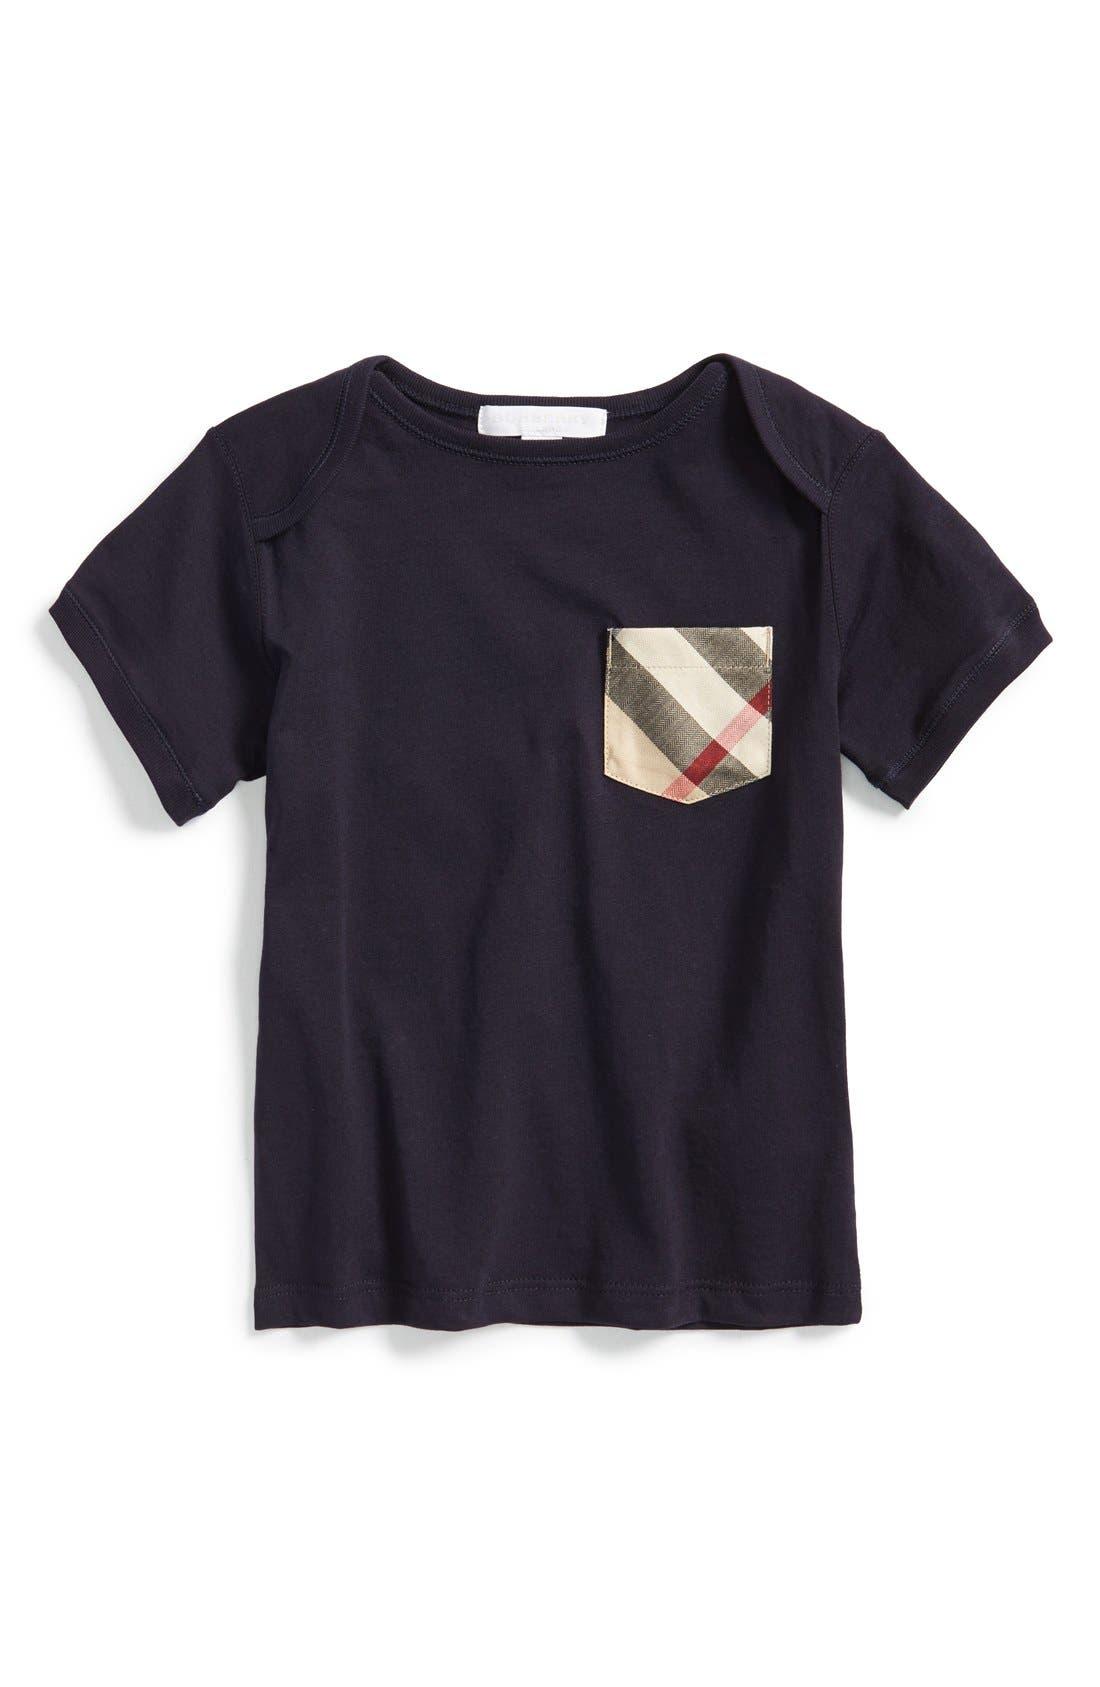 BURBERRY Callum Check Print Chest Pocket Cotton T-Shirt